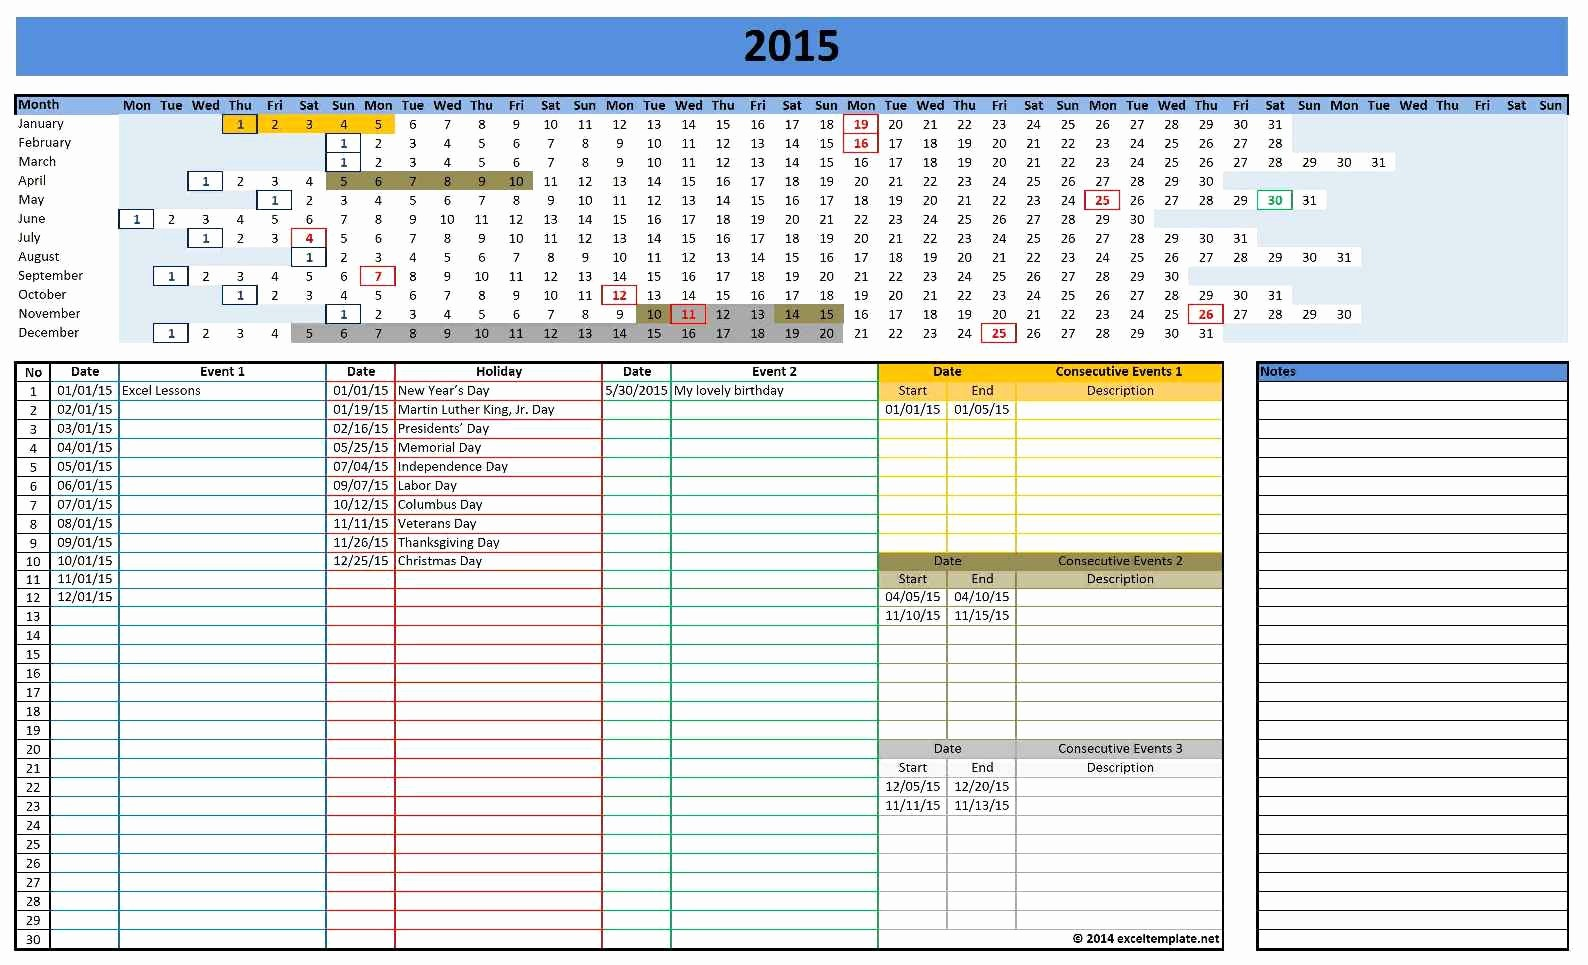 2017 Quarterly Calendar Template Excel Lovely Microsoft Excel Calendar Template 2017